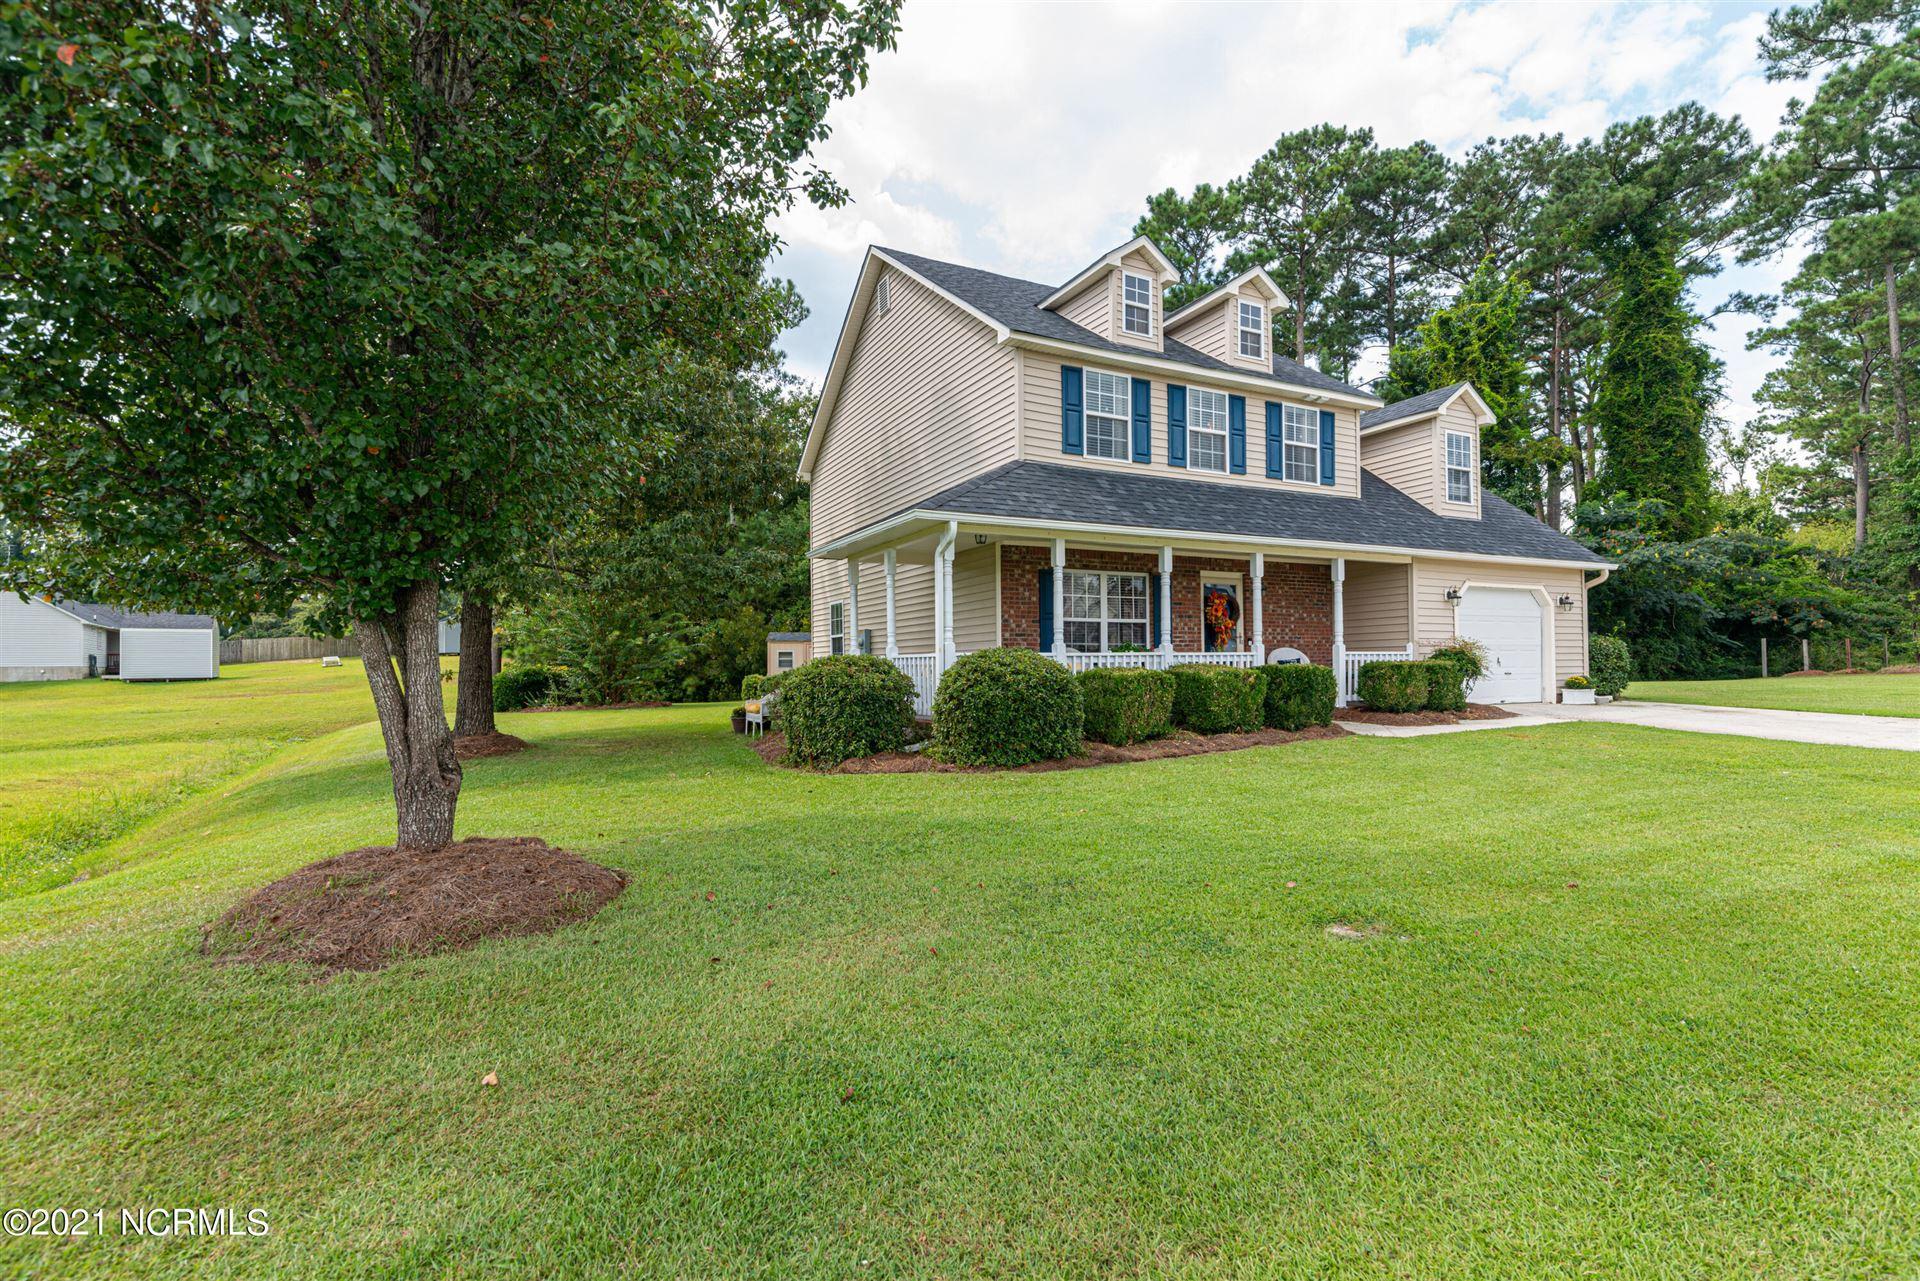 Photo of 103 Winfall Court, Jacksonville, NC 28546 (MLS # 100289493)